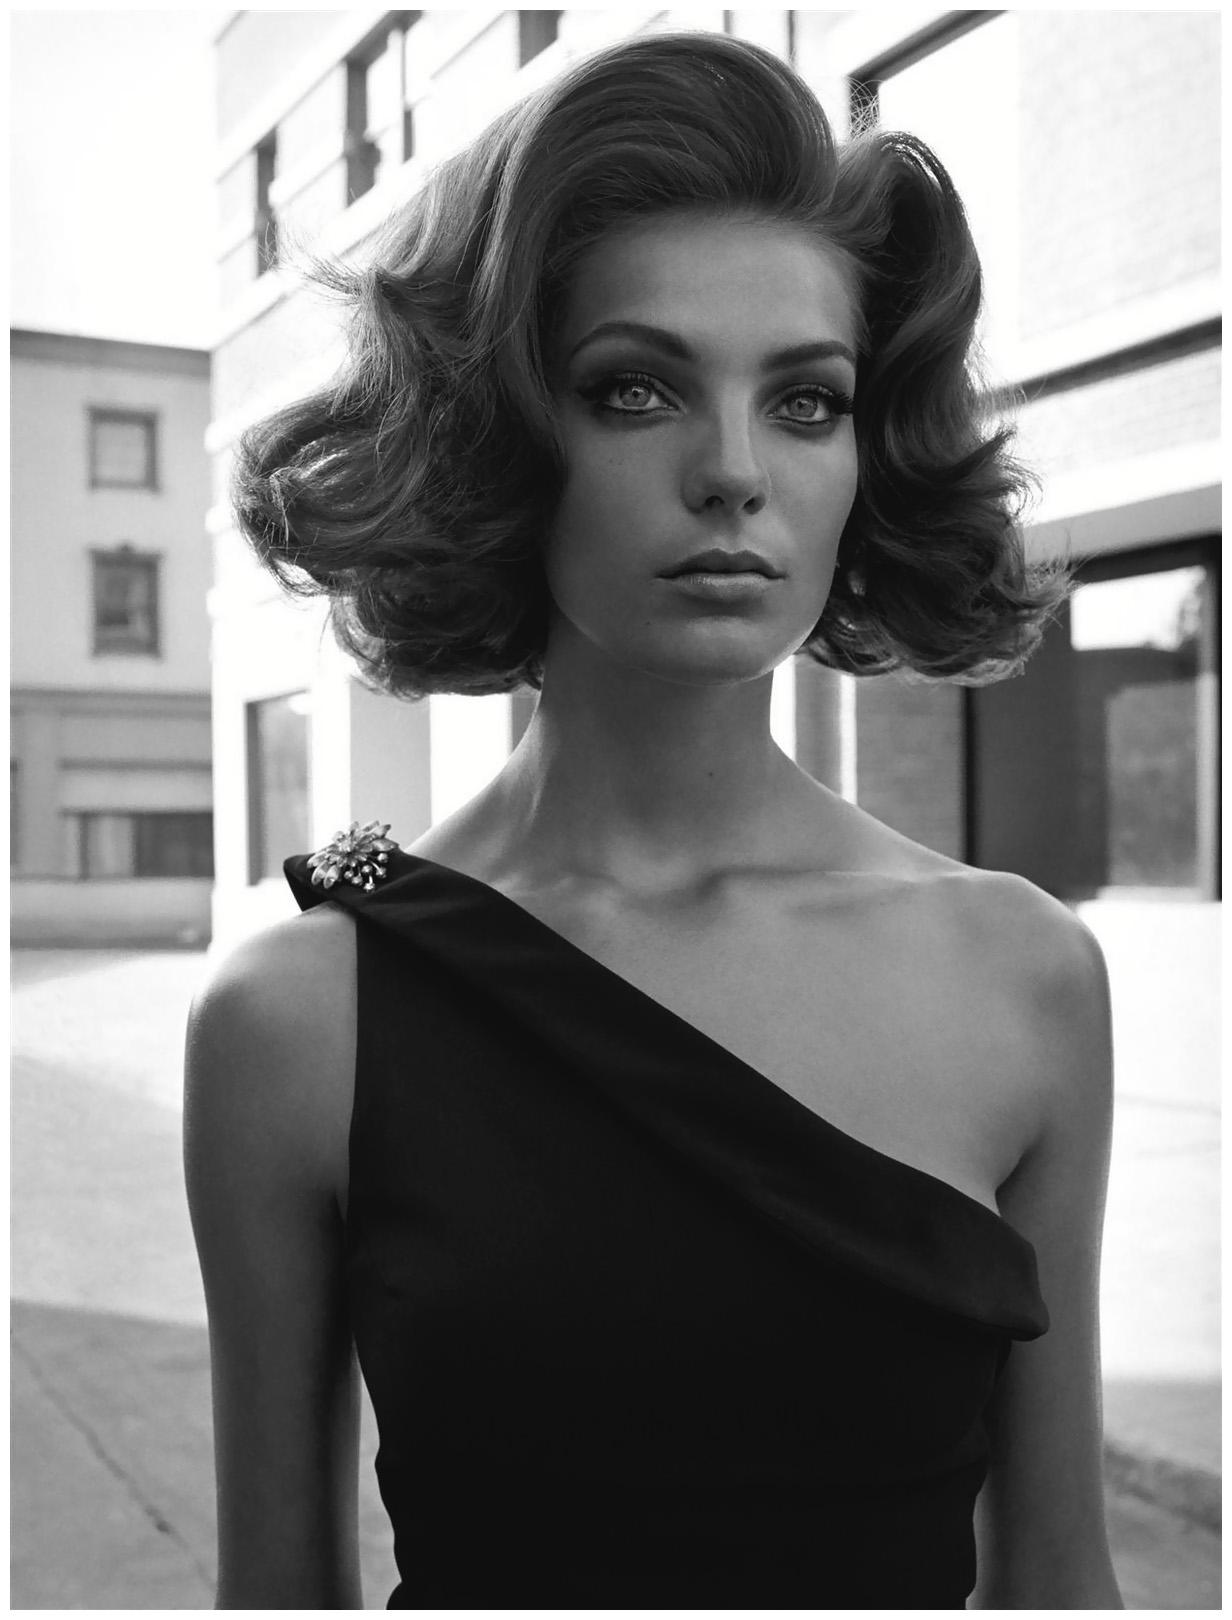 Daria Werbowy Bob Daria Werbowy Vogue it 2003